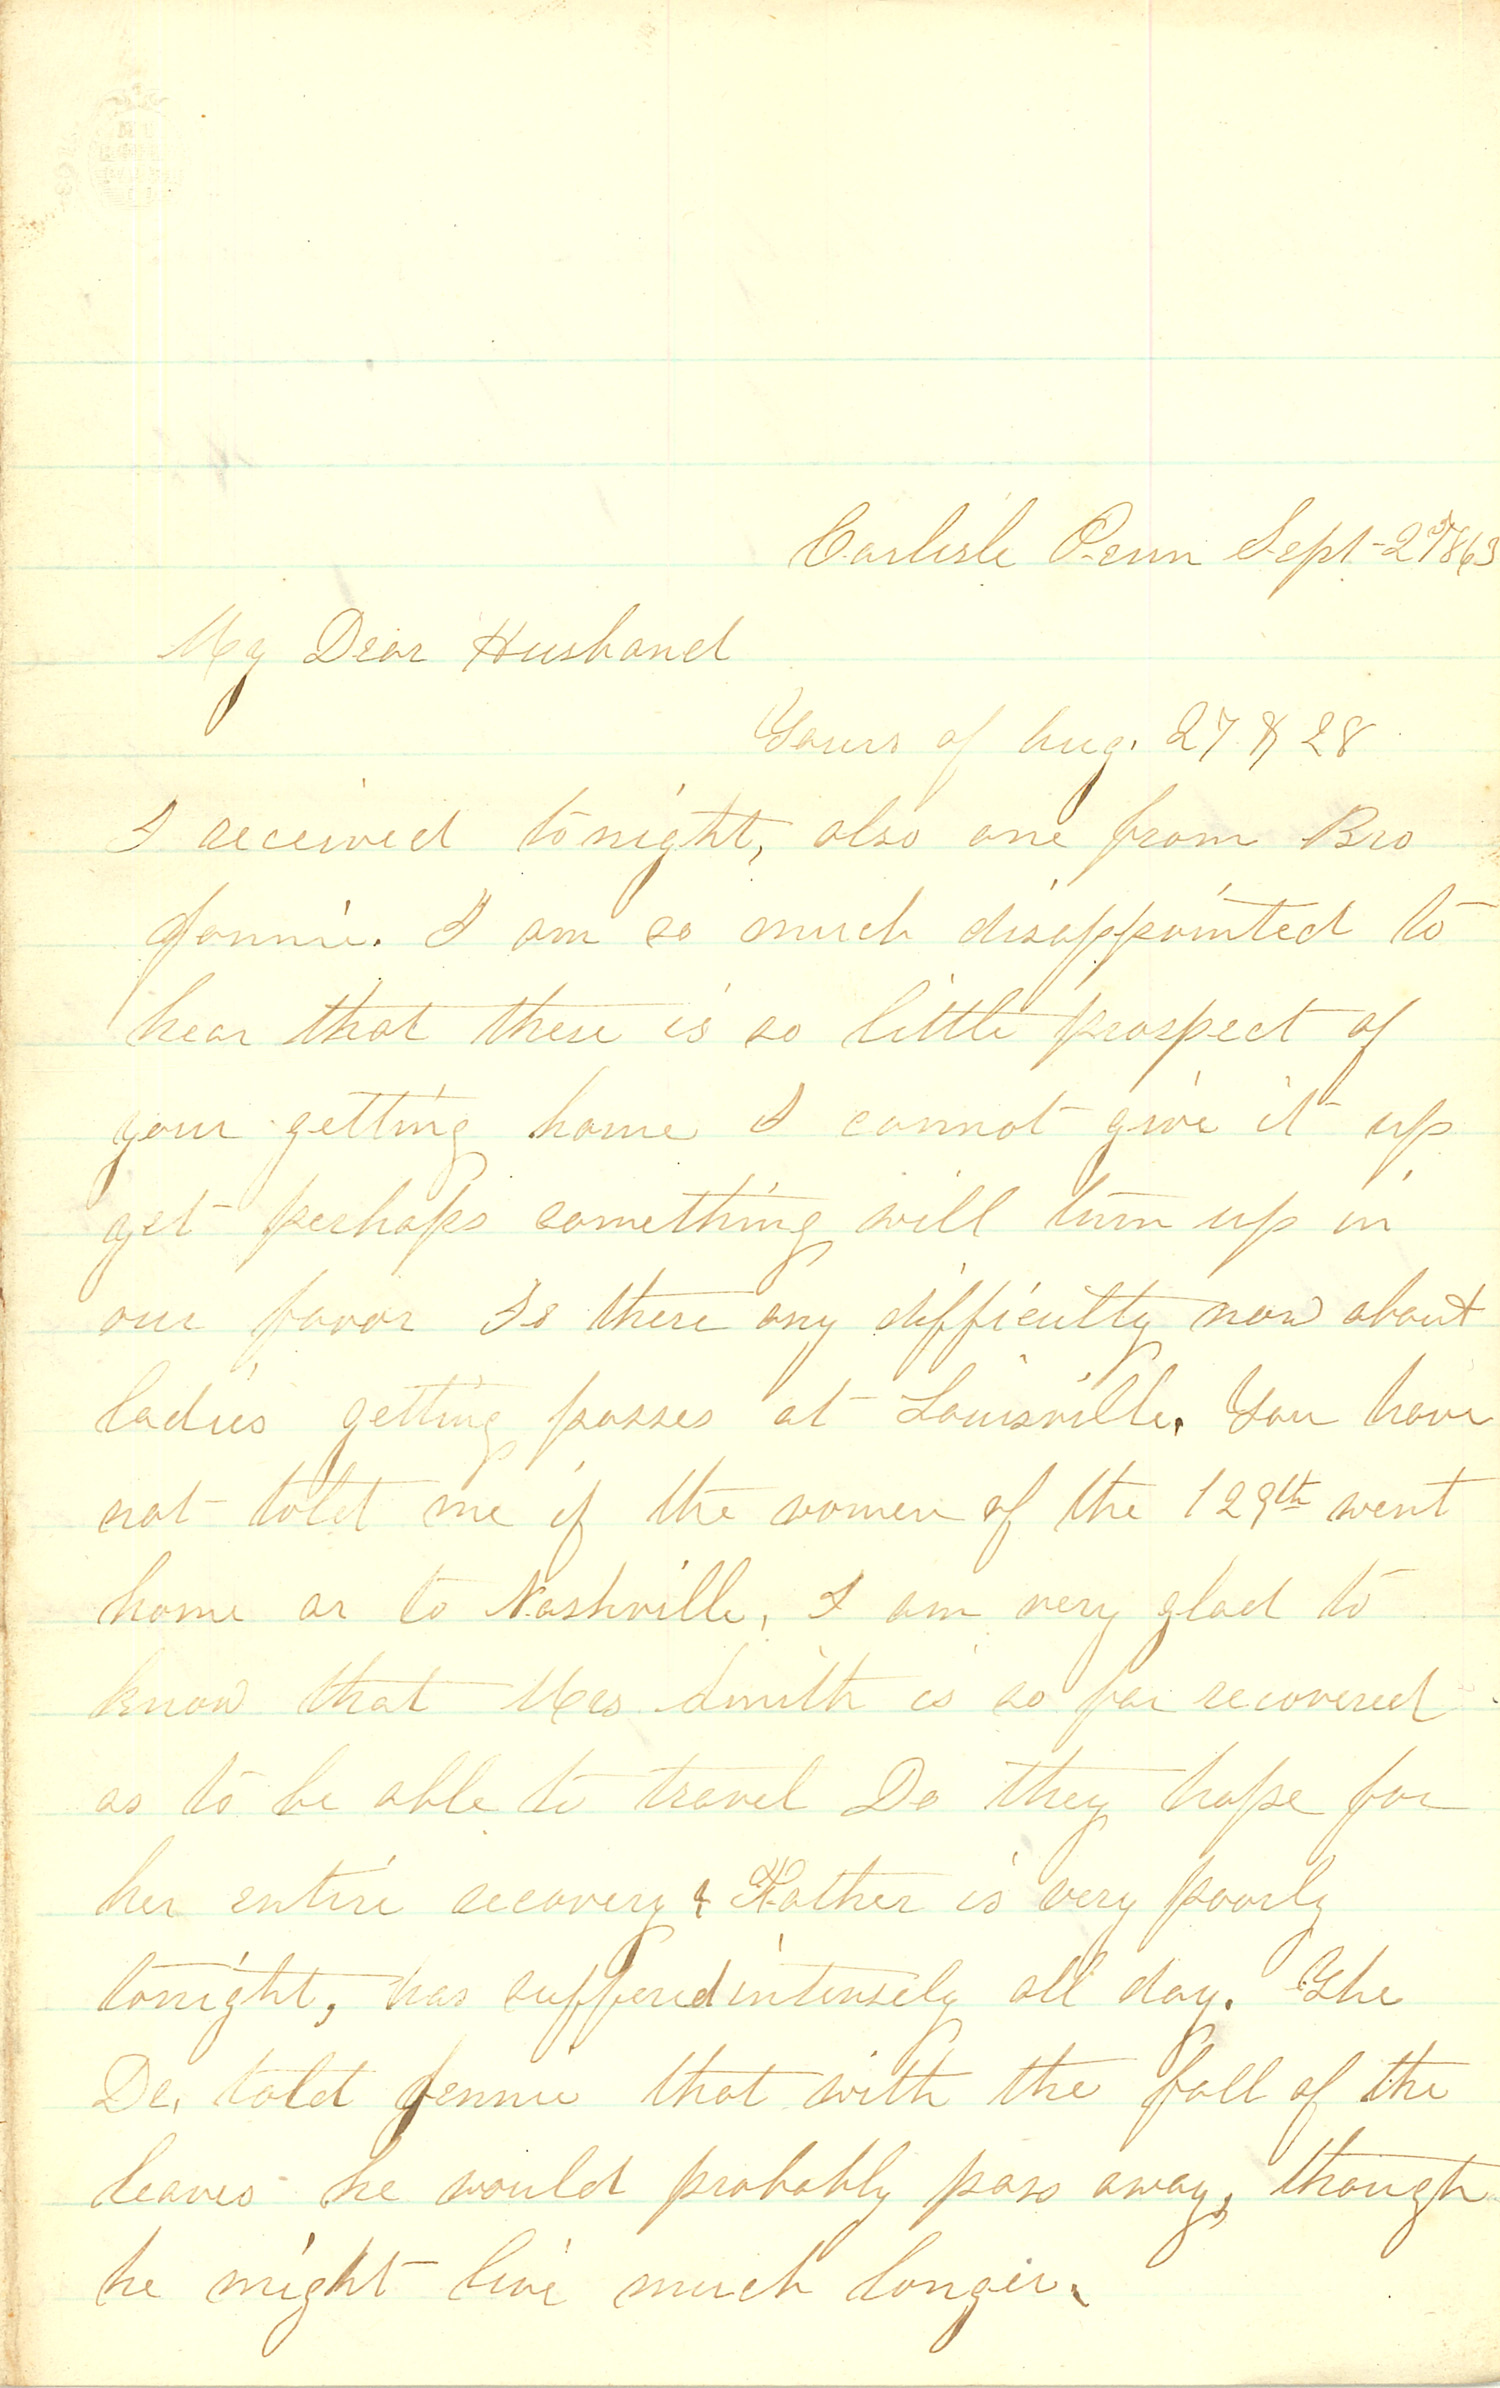 Joseph Culver Letter, September 27, 1863, Page 1